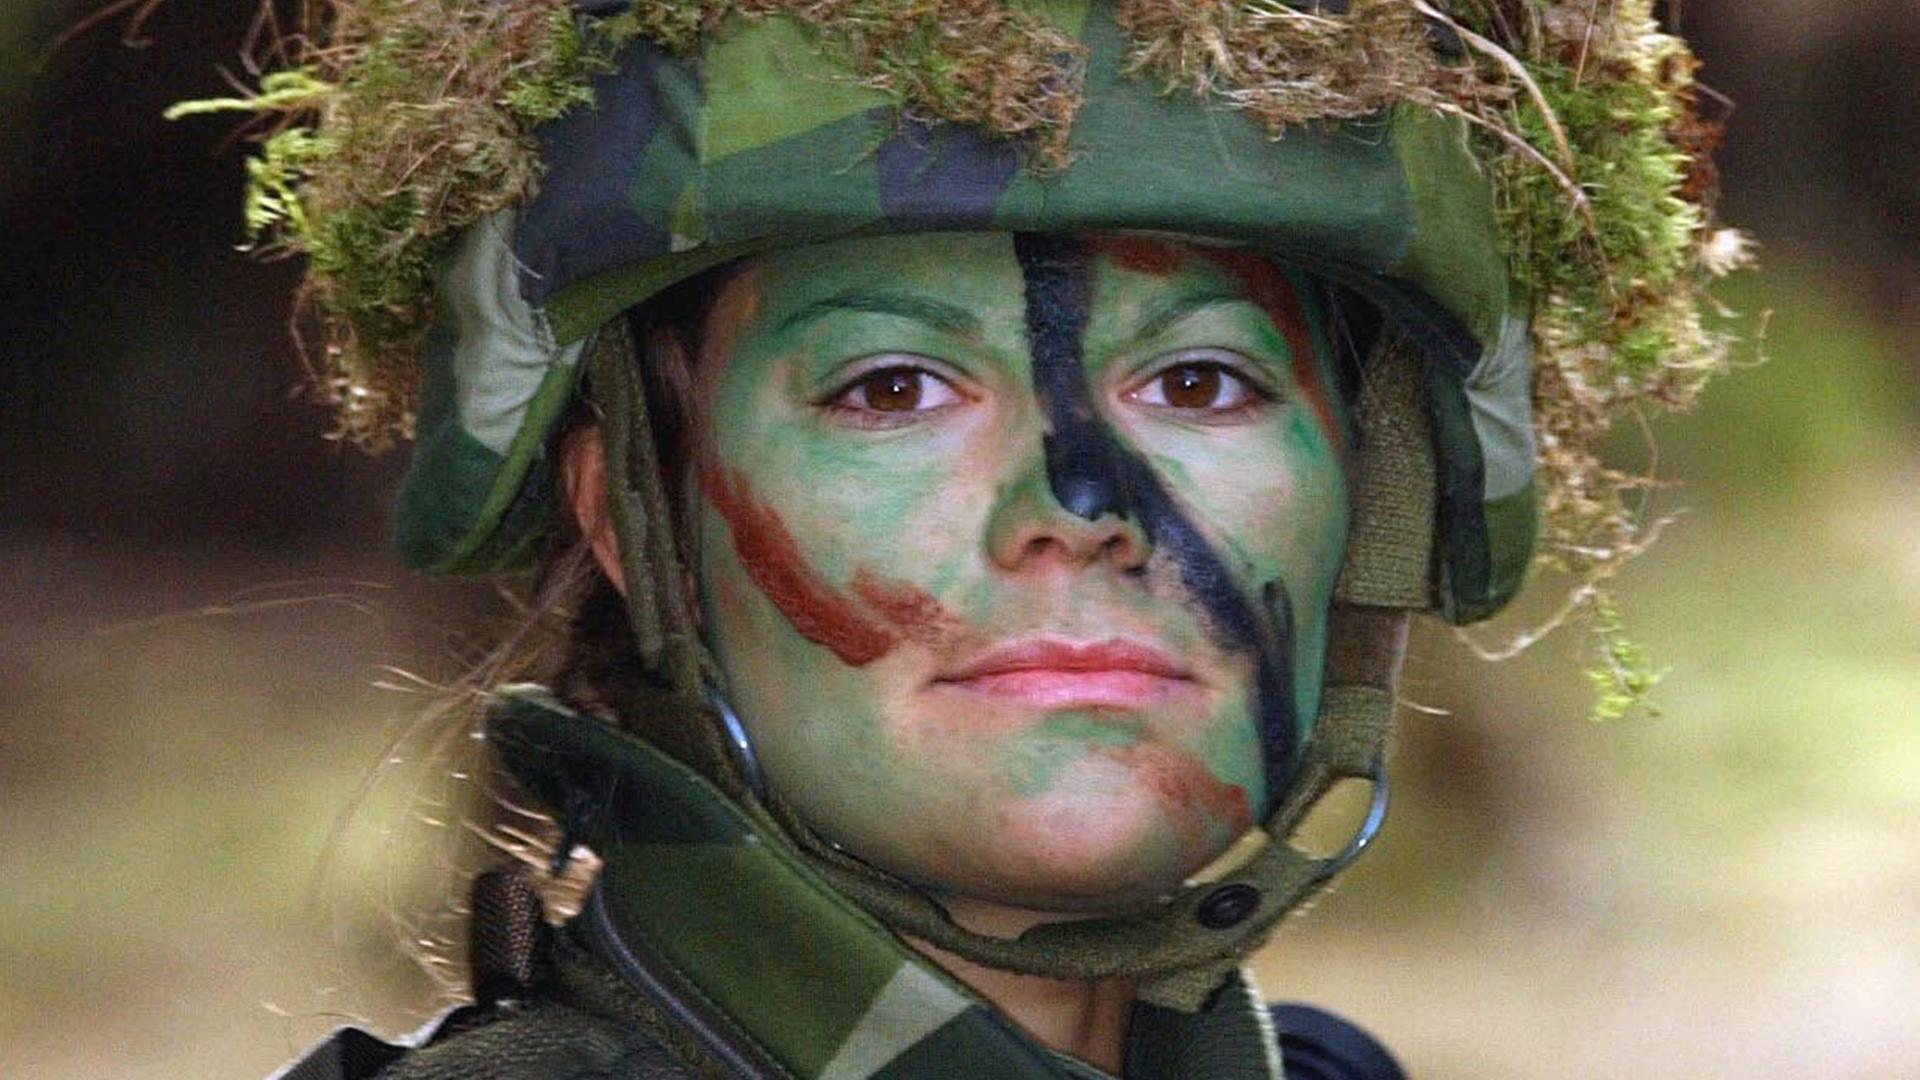 Charmant Armee Lebenslauf Probe Fotos - Entry Level Resume Vorlagen ...